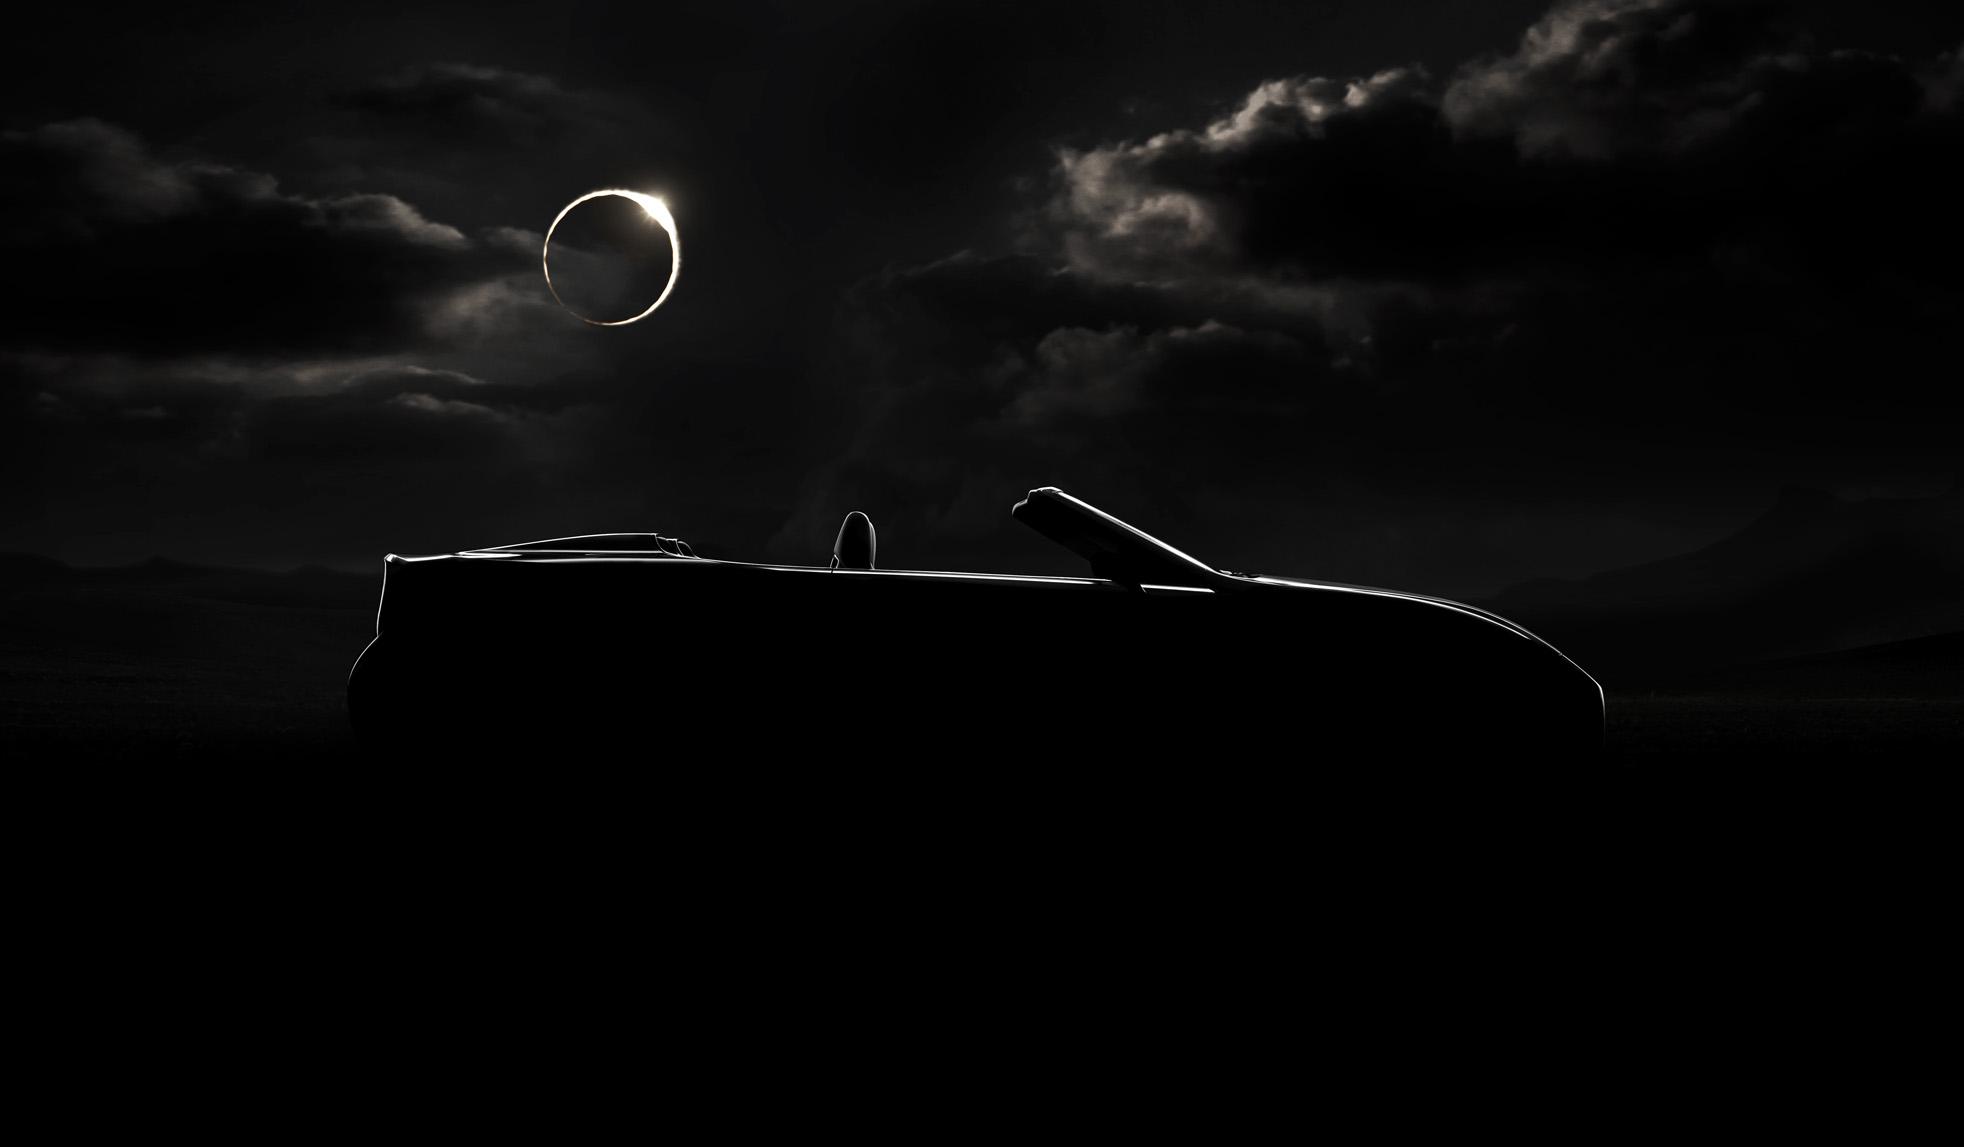 Lexus Concept LF-C2 anteprima a Los Angeles